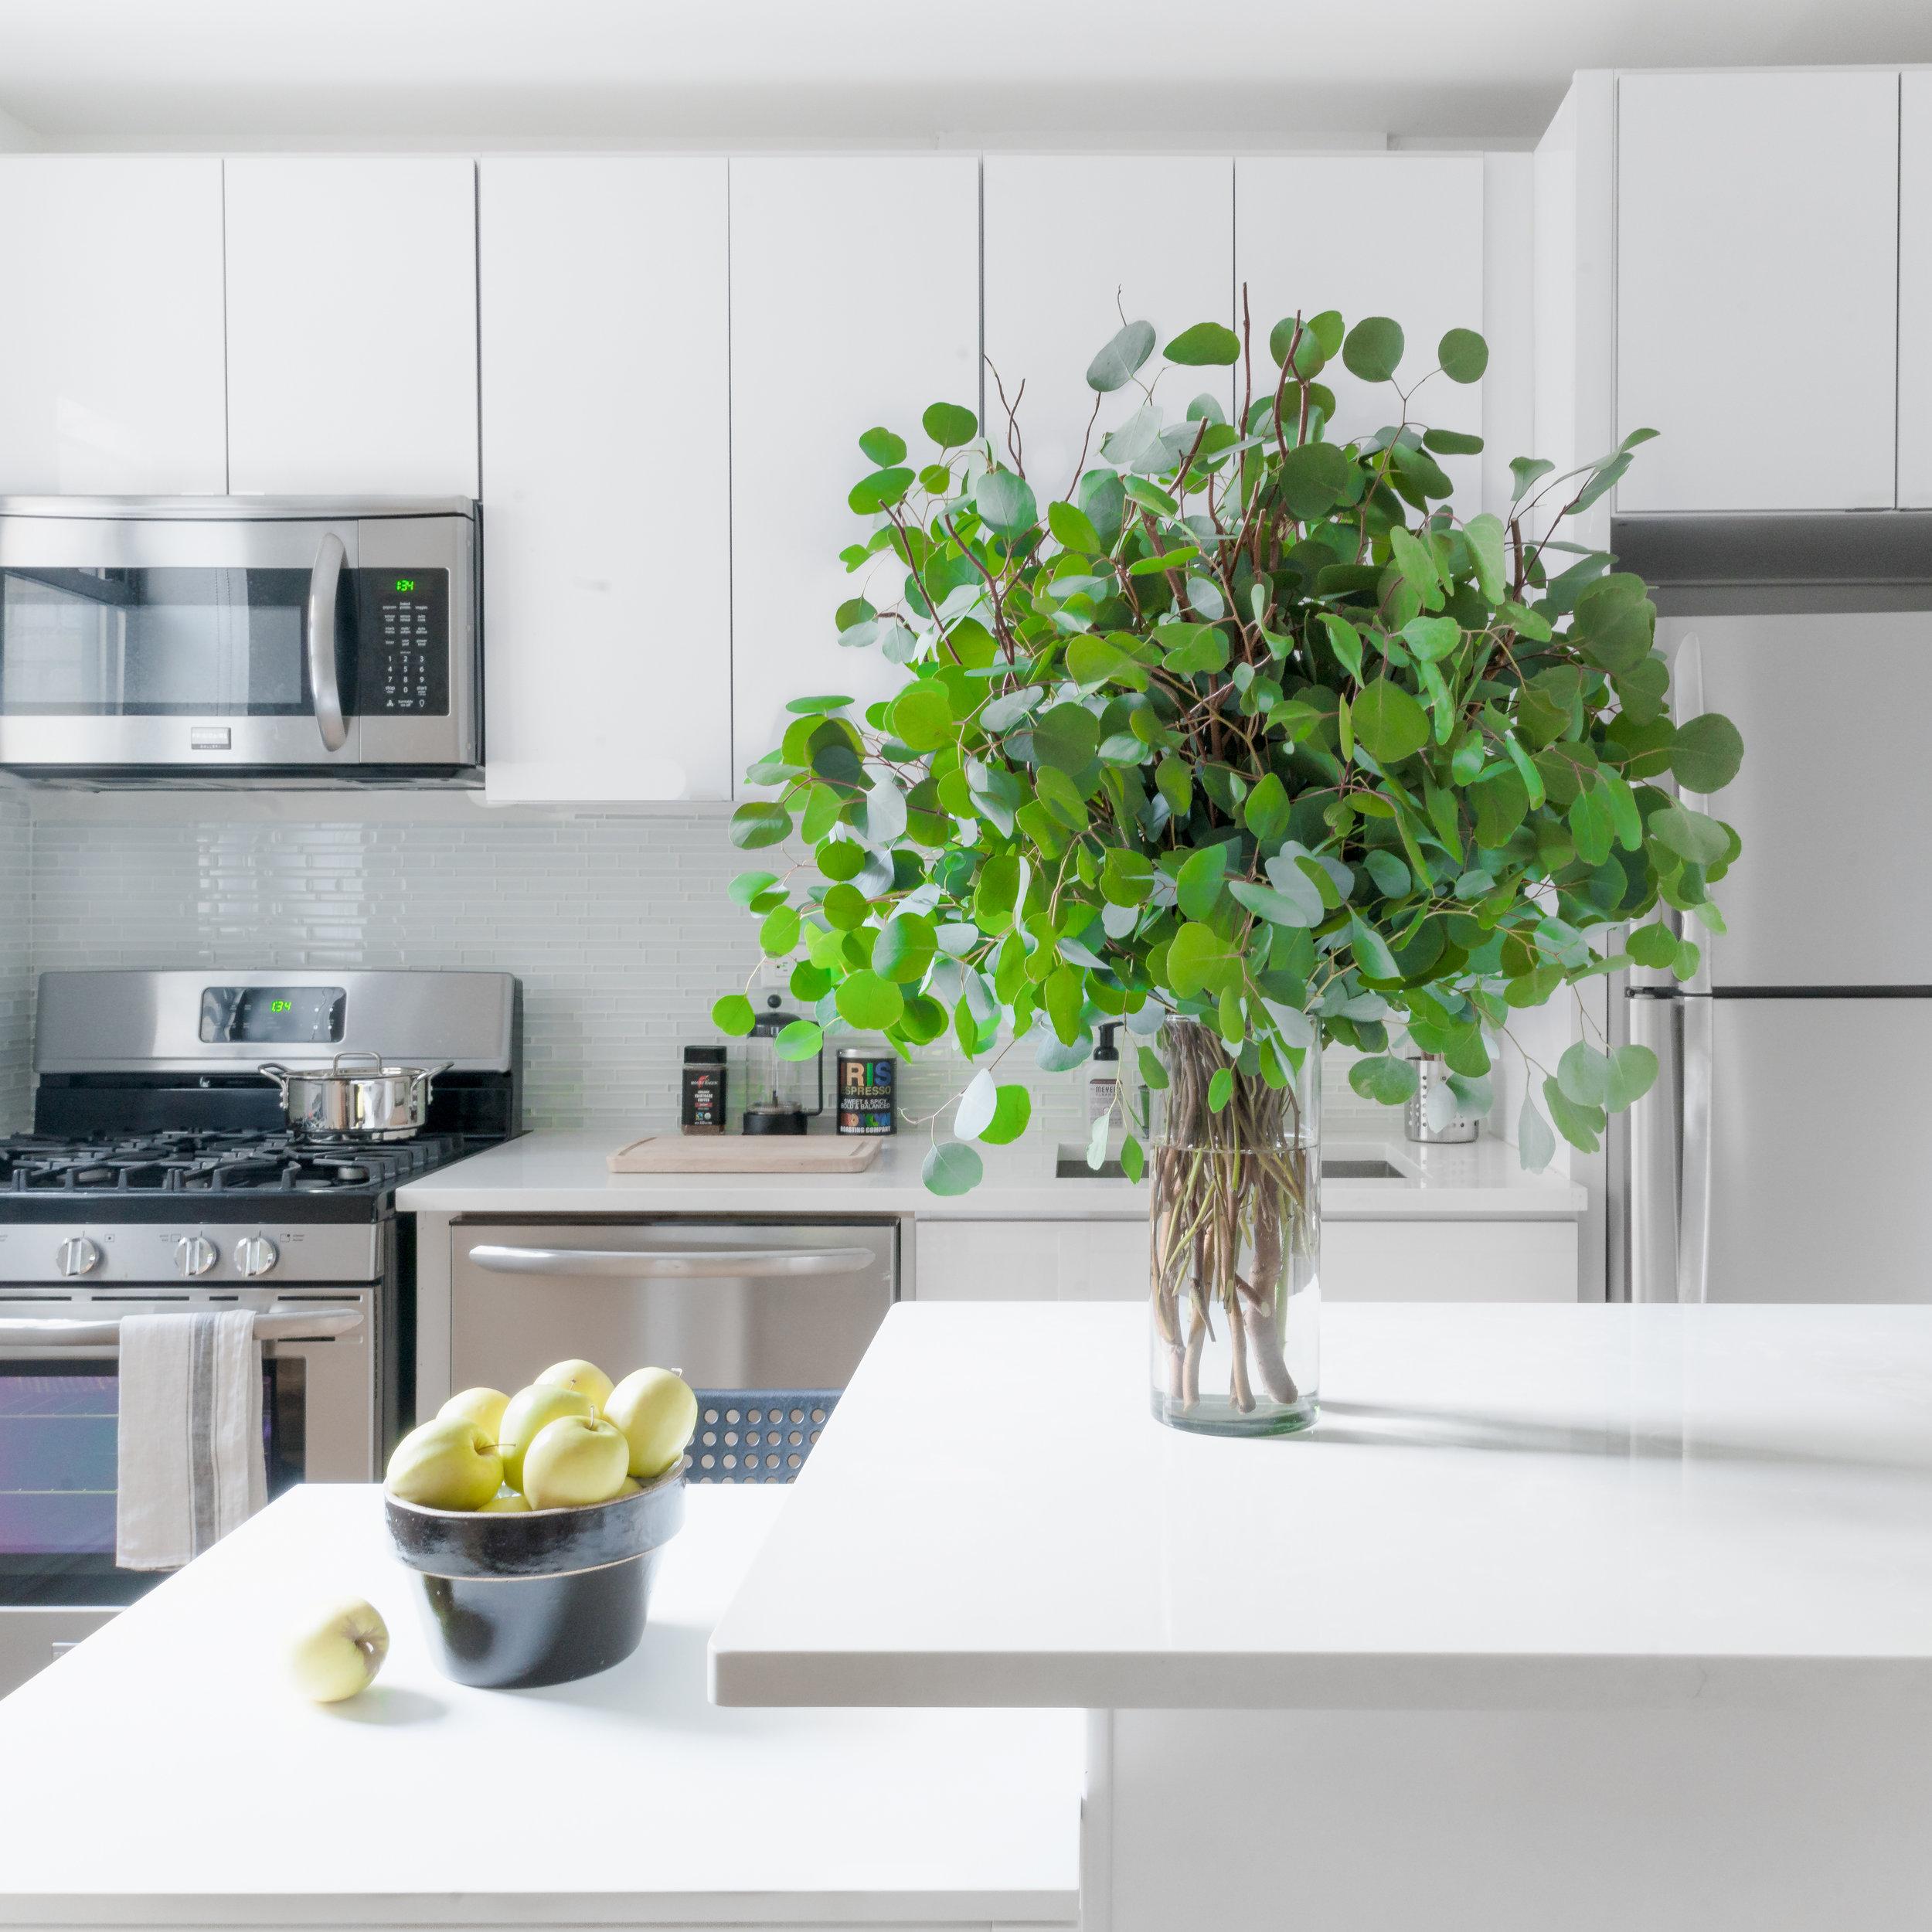 paulaeguzman_interiors_kitchen_bath.jpg